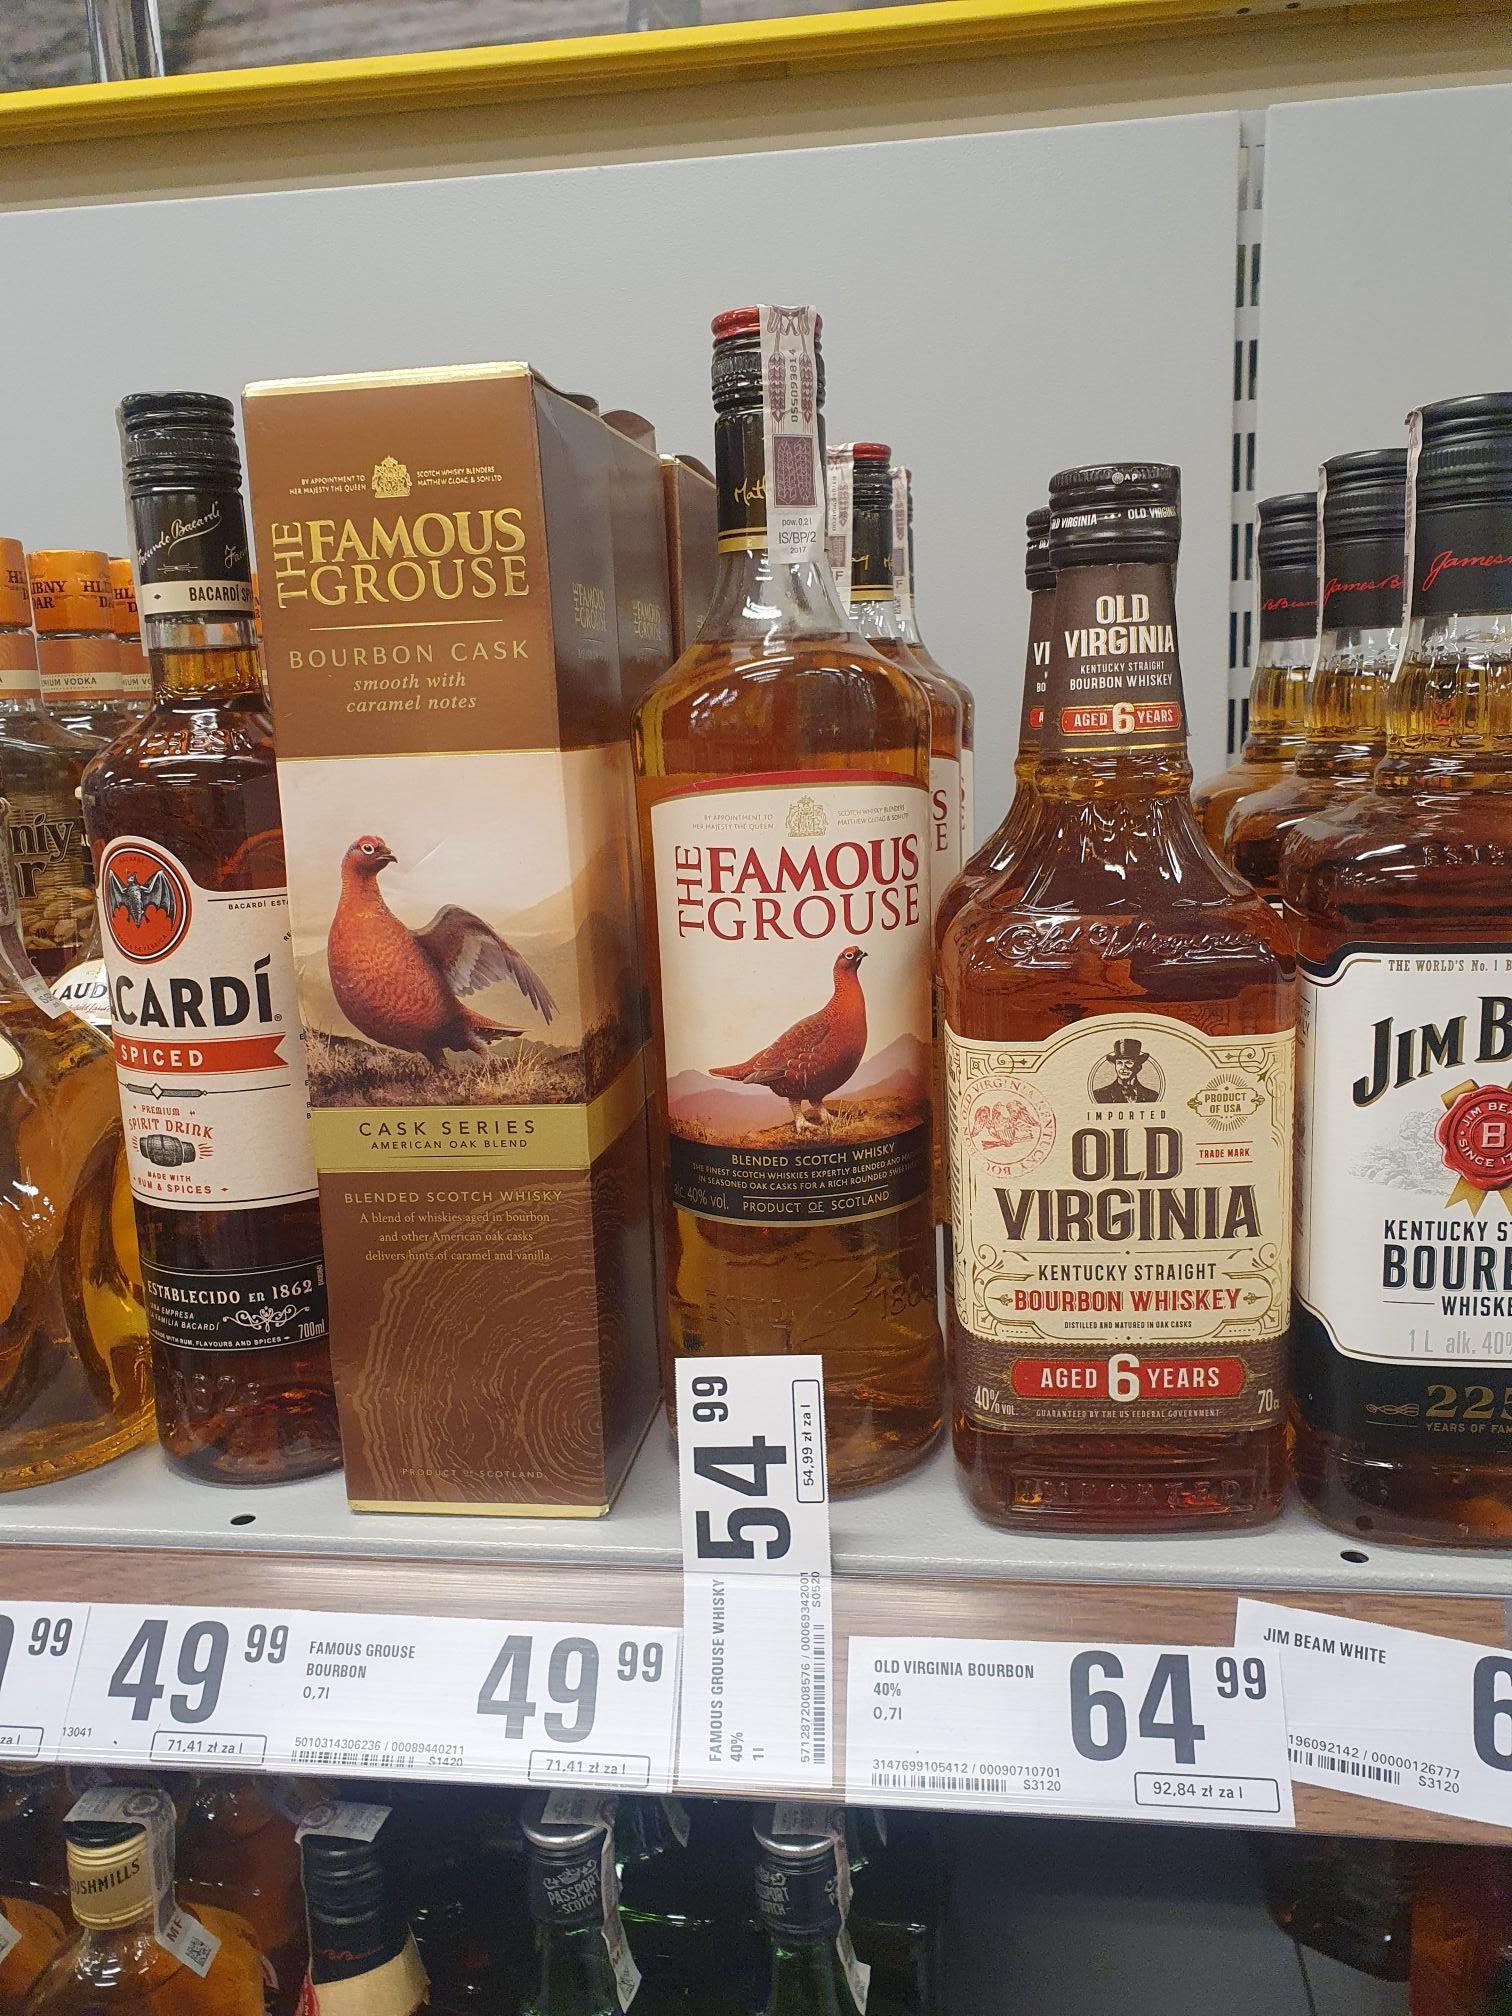 Whisky The Famous Grouse (Pardwa) za 54.99, bourbon / whisky Cask Series za 49.99 oraz Old Virginia za 64.99 @Netto